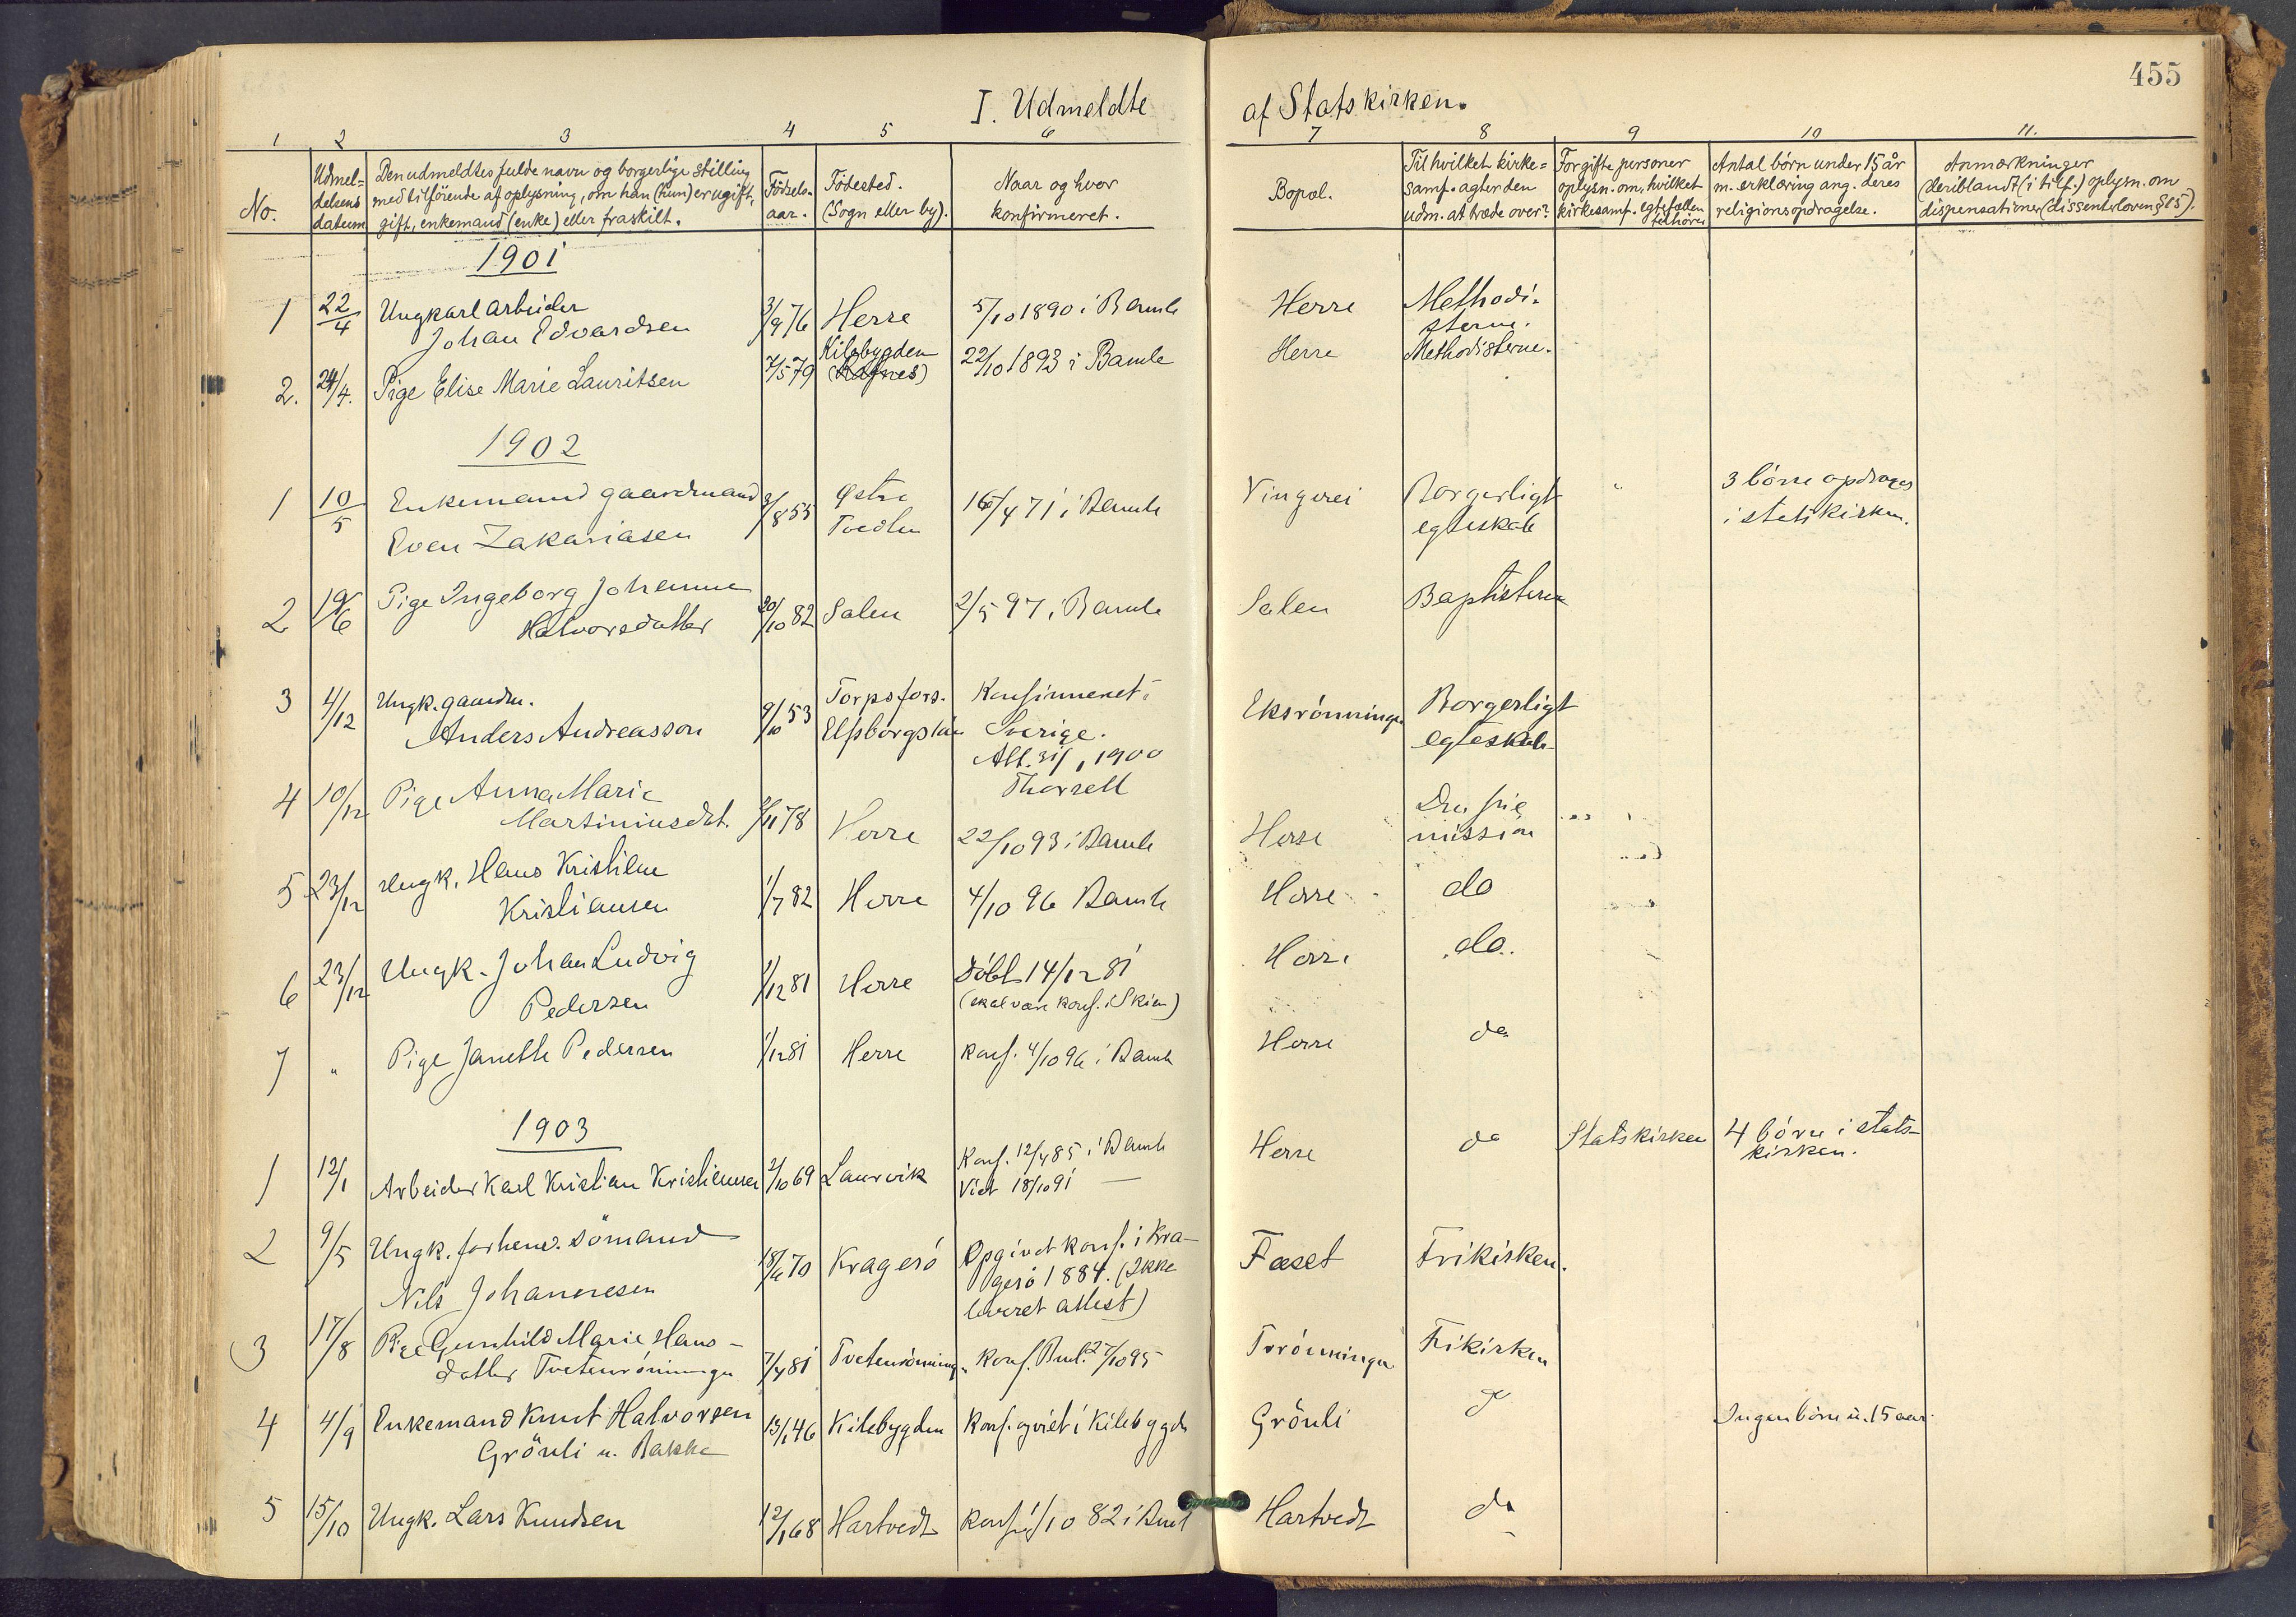 SAKO, Bamble kirkebøker, F/Fa/L0009: Ministerialbok nr. I 9, 1901-1917, s. 455